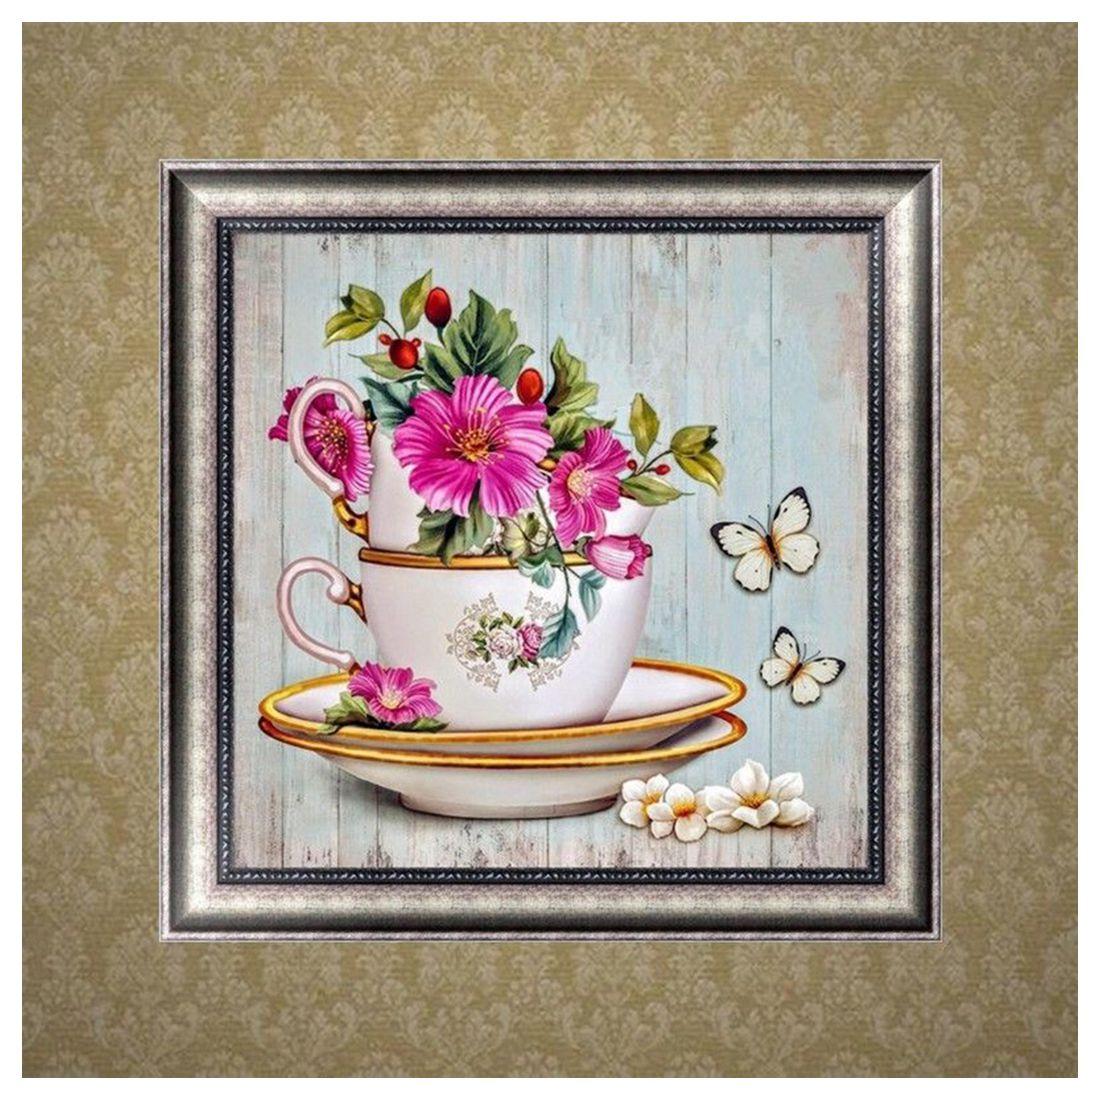 Diy 5d Diamond Embroidery Painting Flower Cross Stitch Home Decor Kit Craft S1f4 Ebay